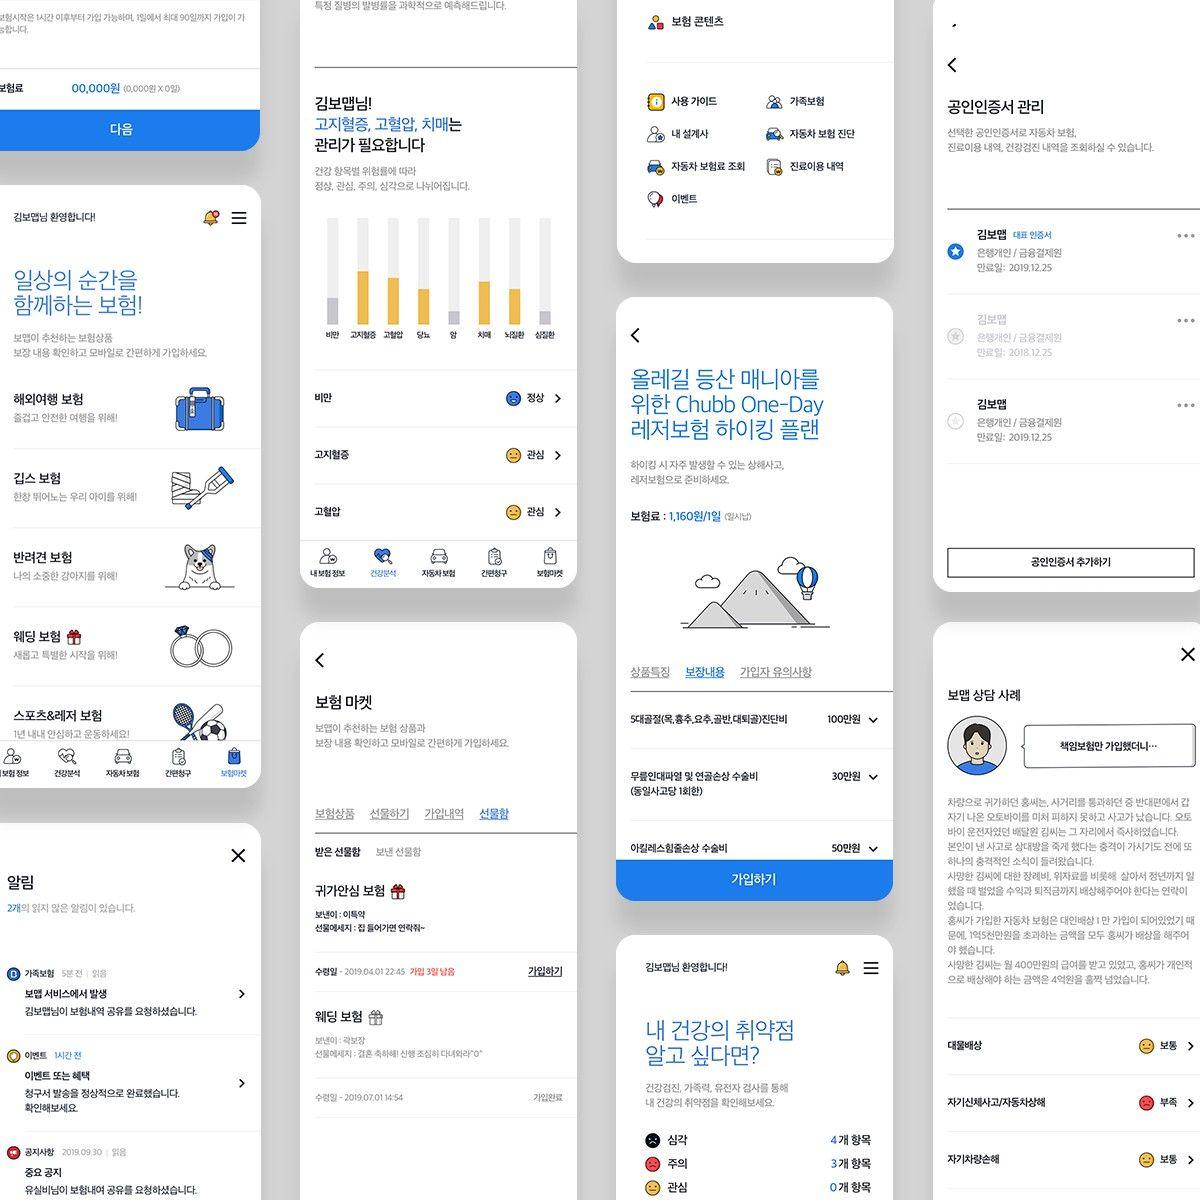 App Design에 있는 Daisy님의 핀 2020 웹디자인 금융 모바일 앱